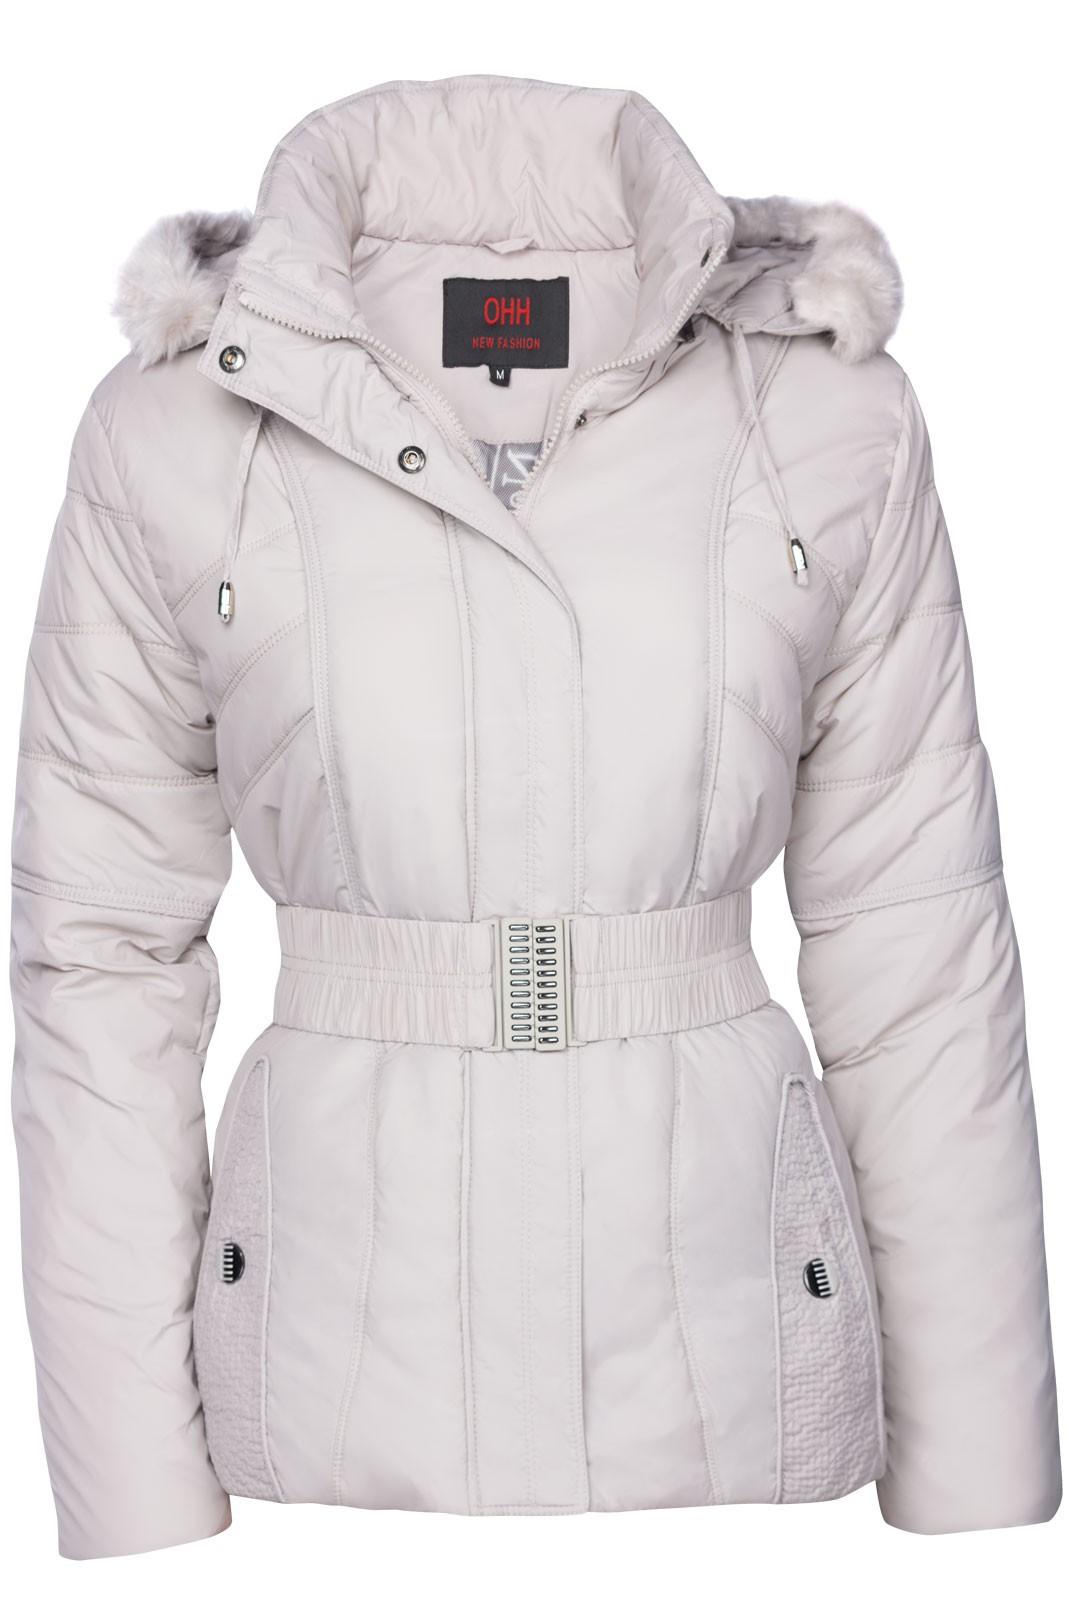 top damen winter jacke stepp daunen optik fell kapuze skijacke kurz mantel ebay. Black Bedroom Furniture Sets. Home Design Ideas